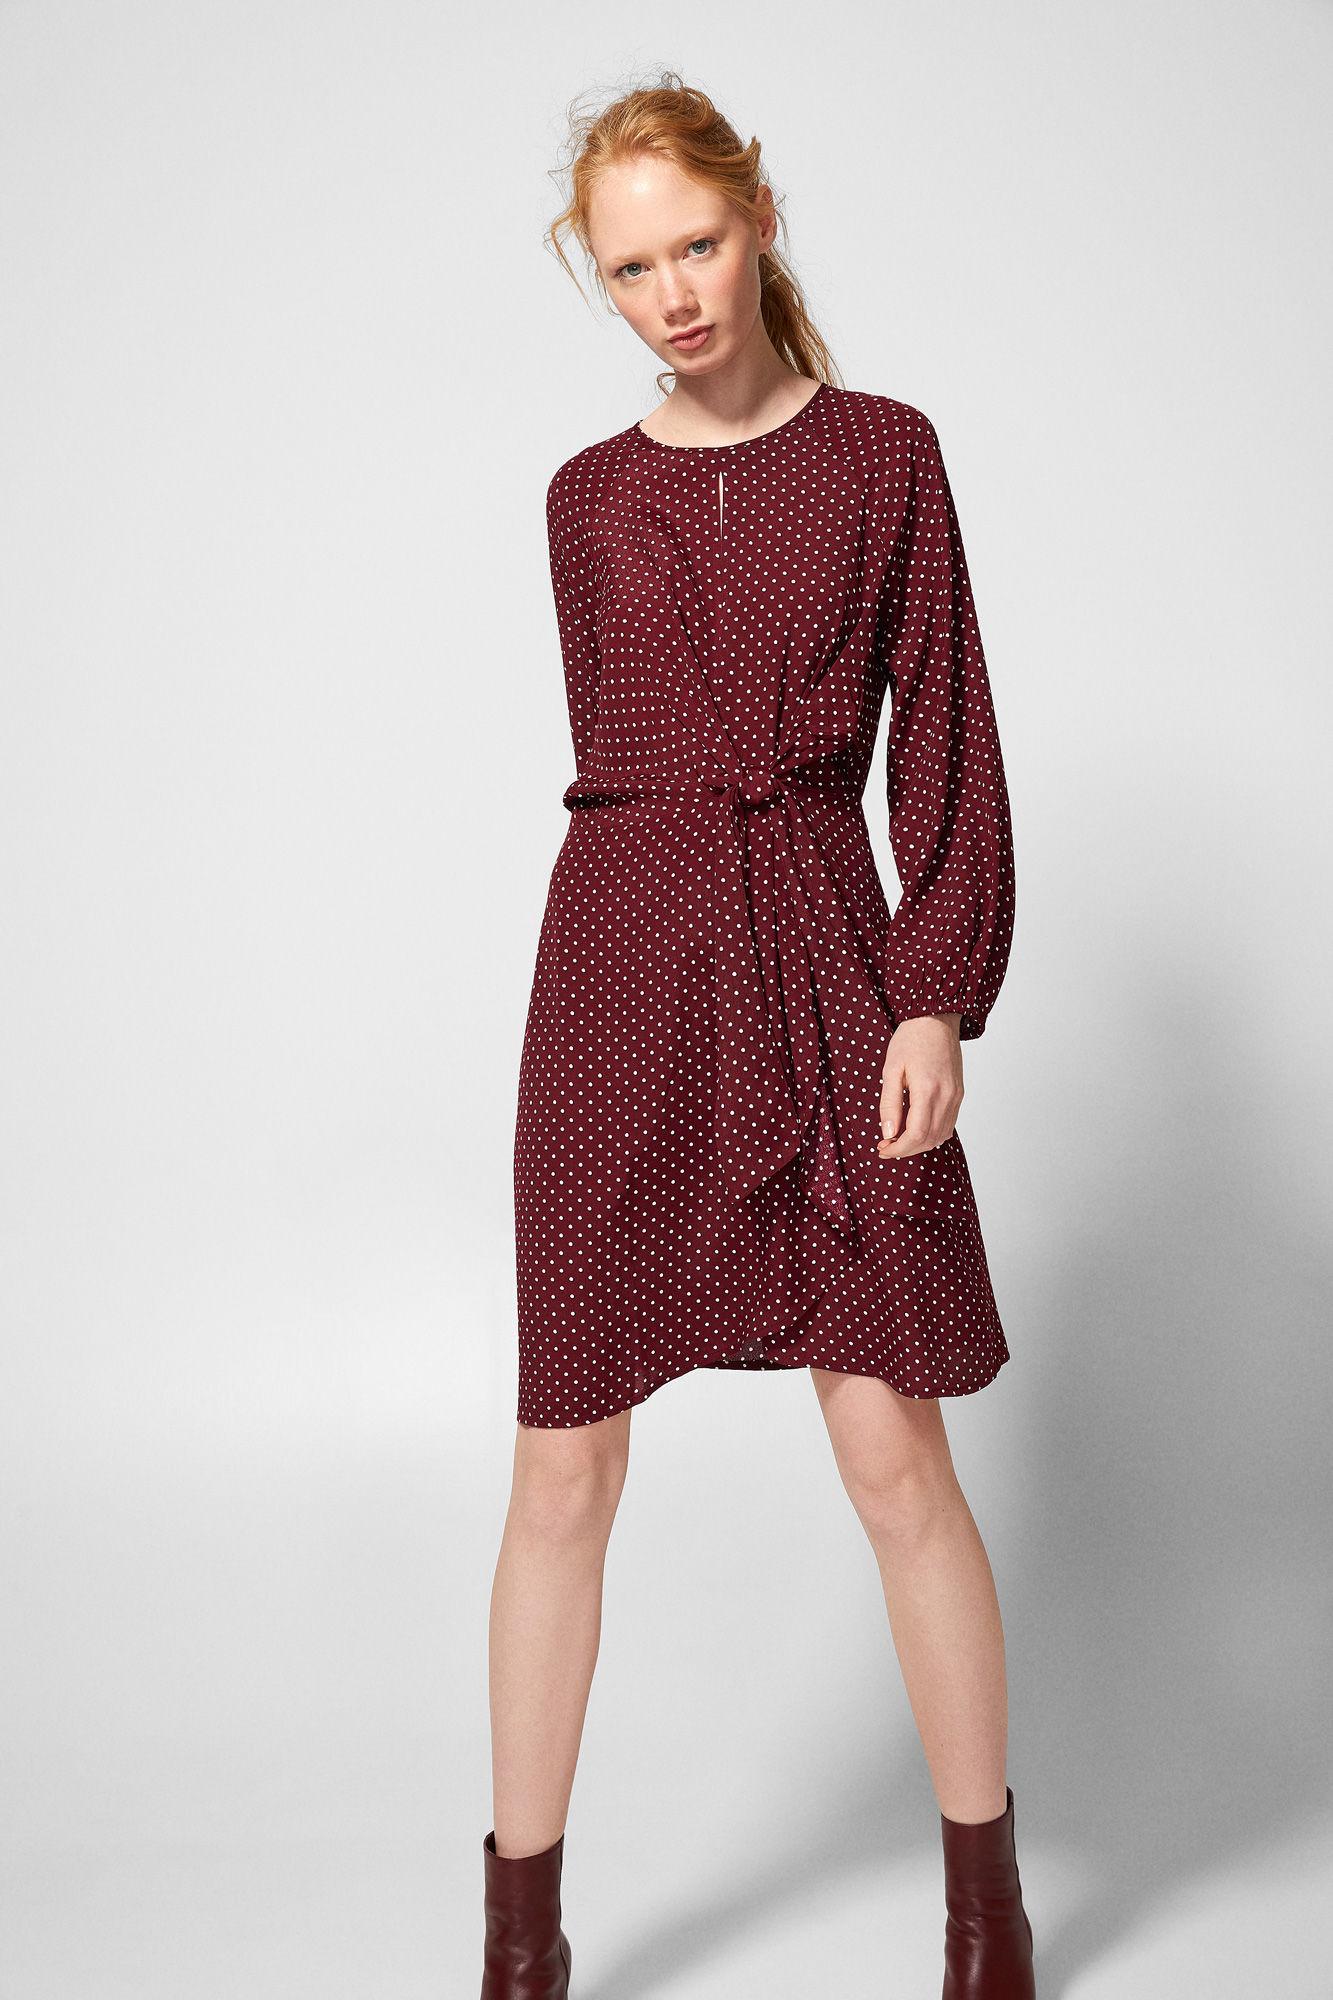 d185d3c804a Βρήκαμε τα πιο όμορφα φθινοπωρινά φορέματα που θα φοράμε από το πρωί ...